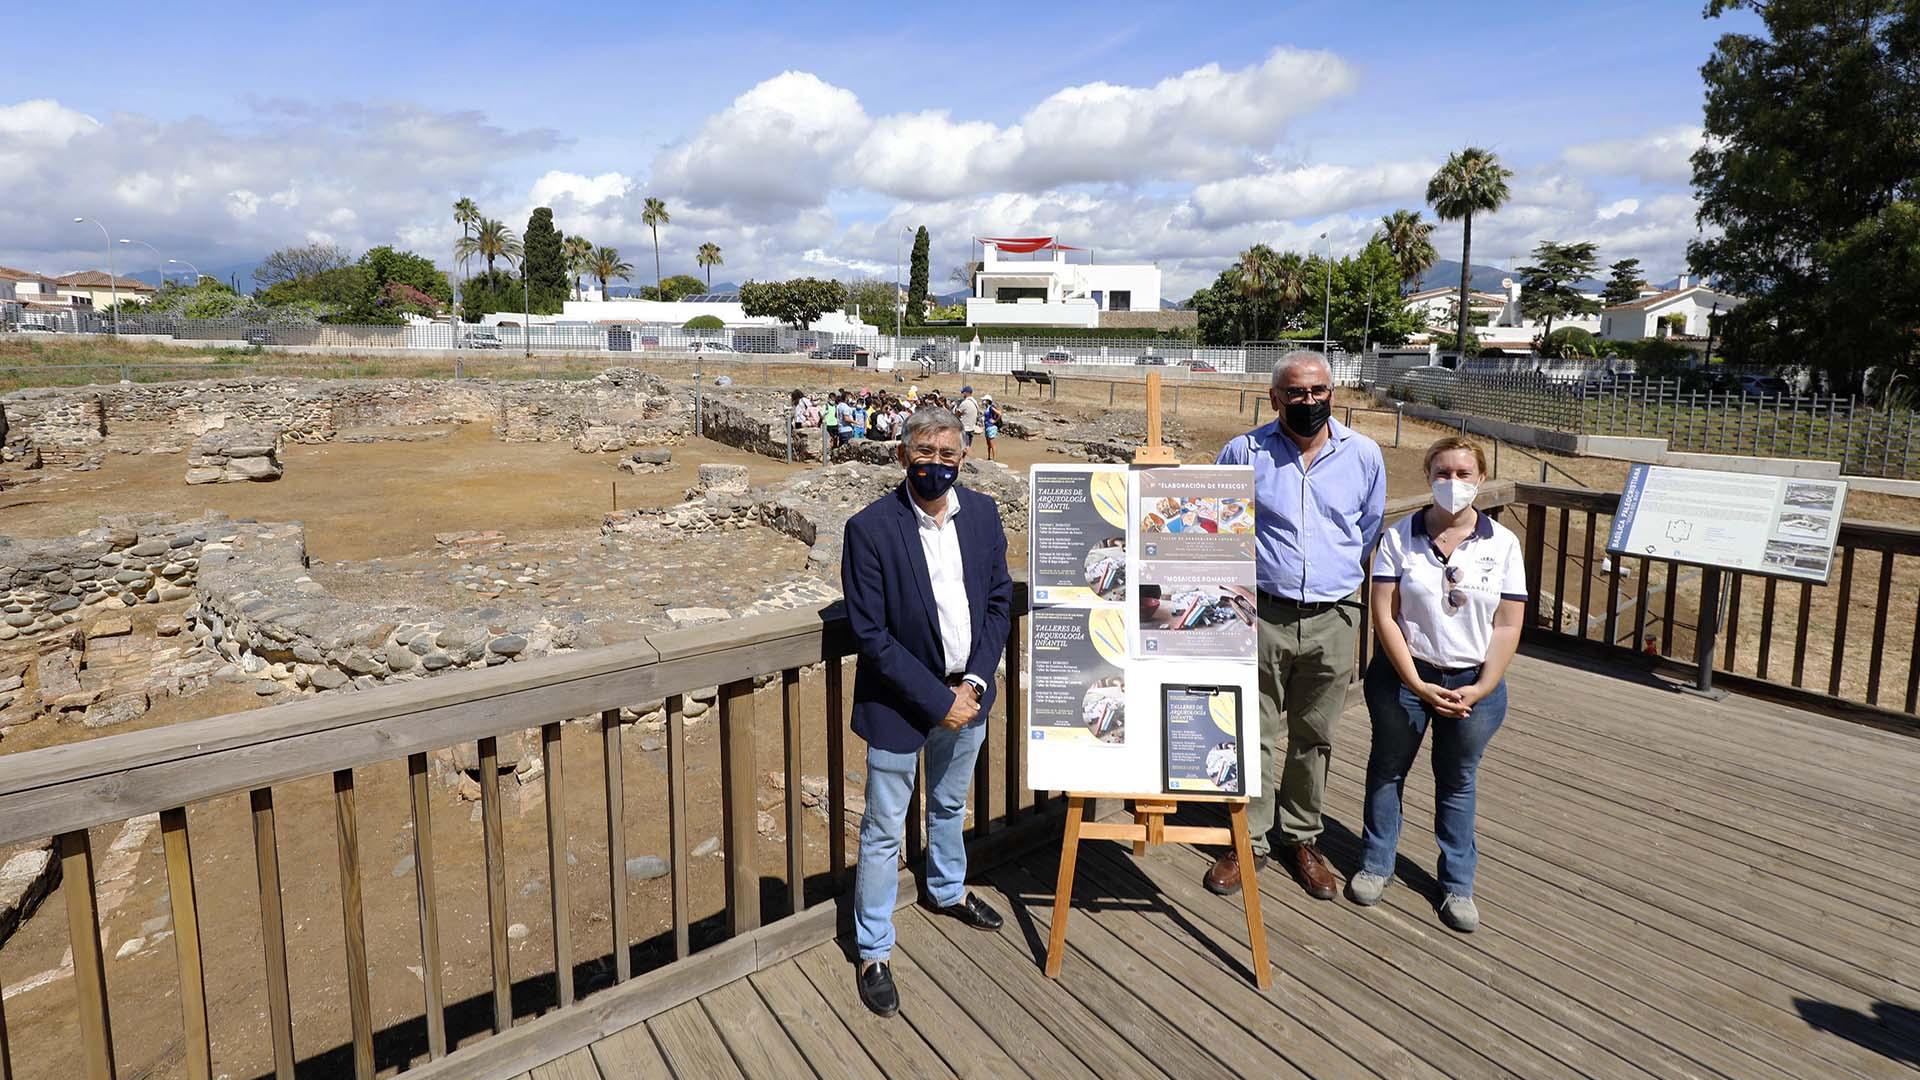 Talleres arqueológicos infantiles para divulgar el patrimonio histórico de San Pedro Alcántara